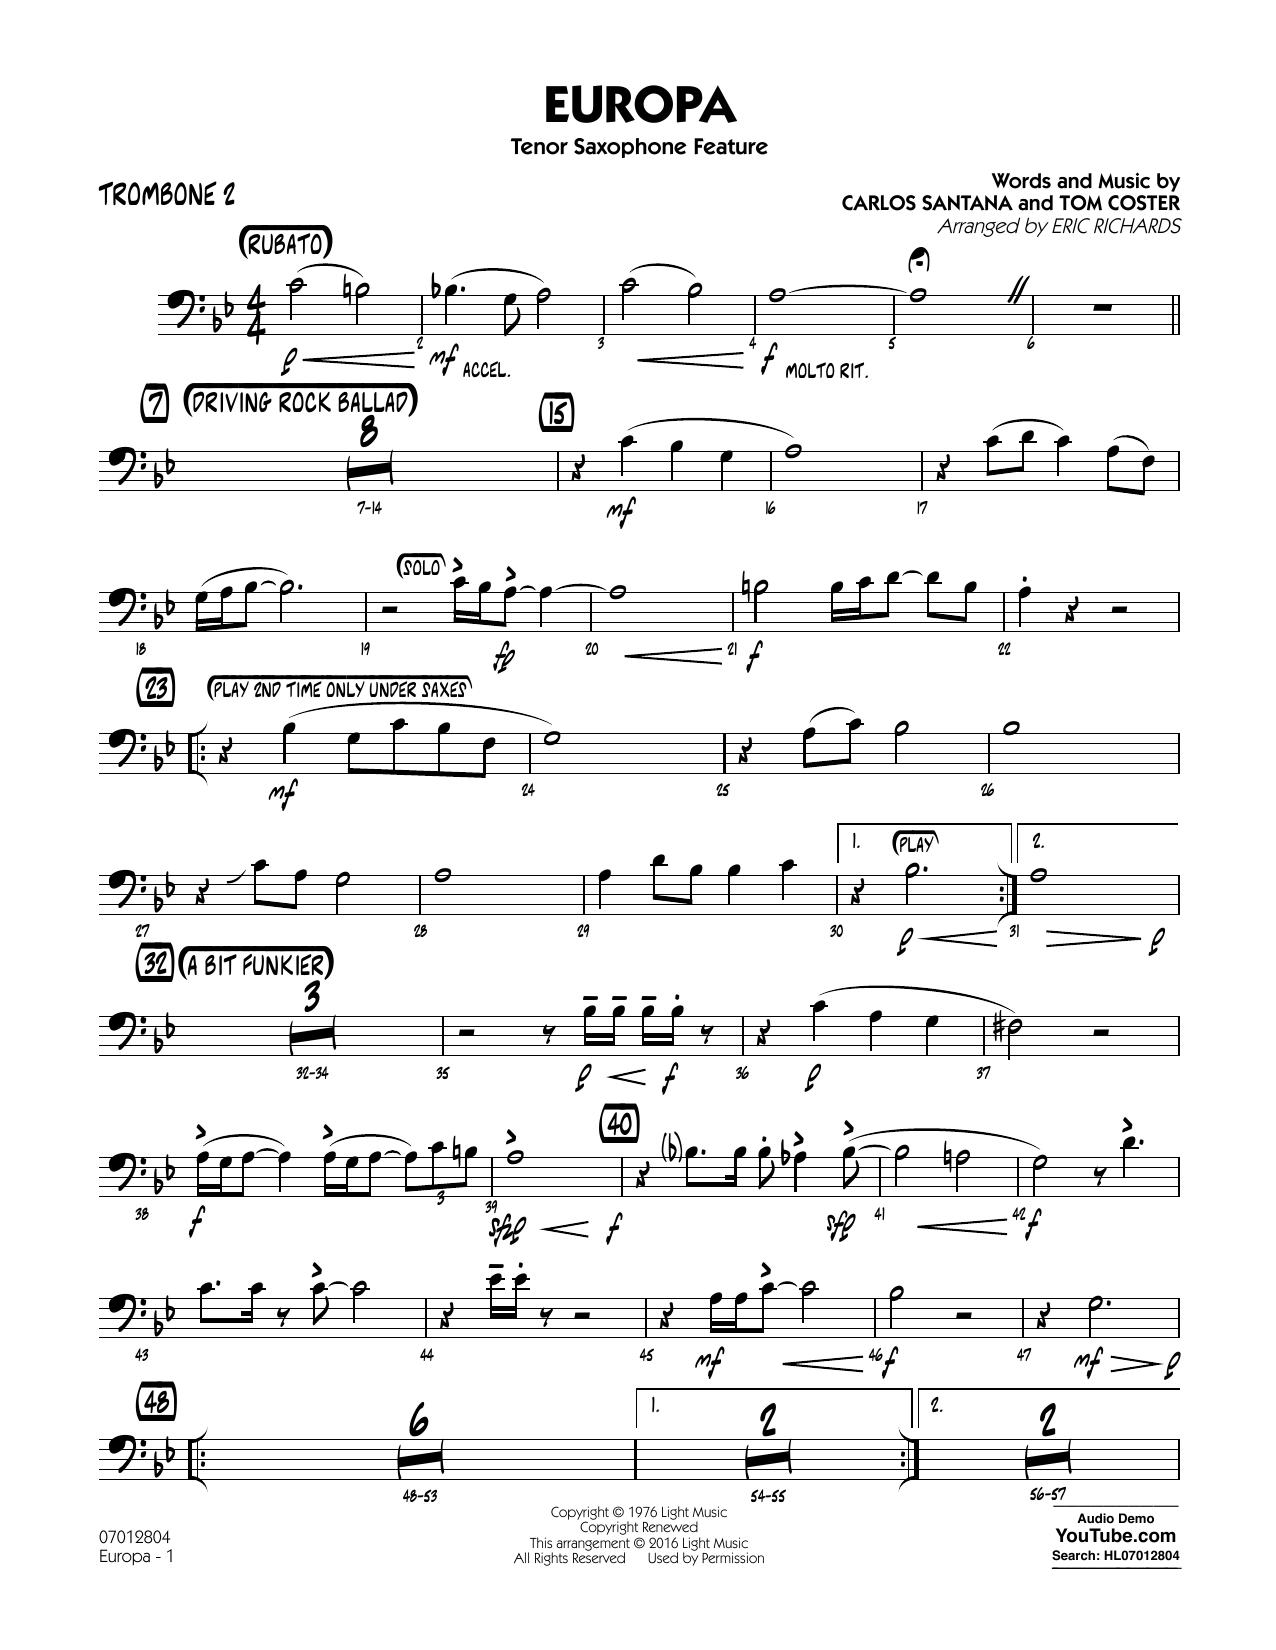 Europa - Trombone 2 (Jazz Ensemble)